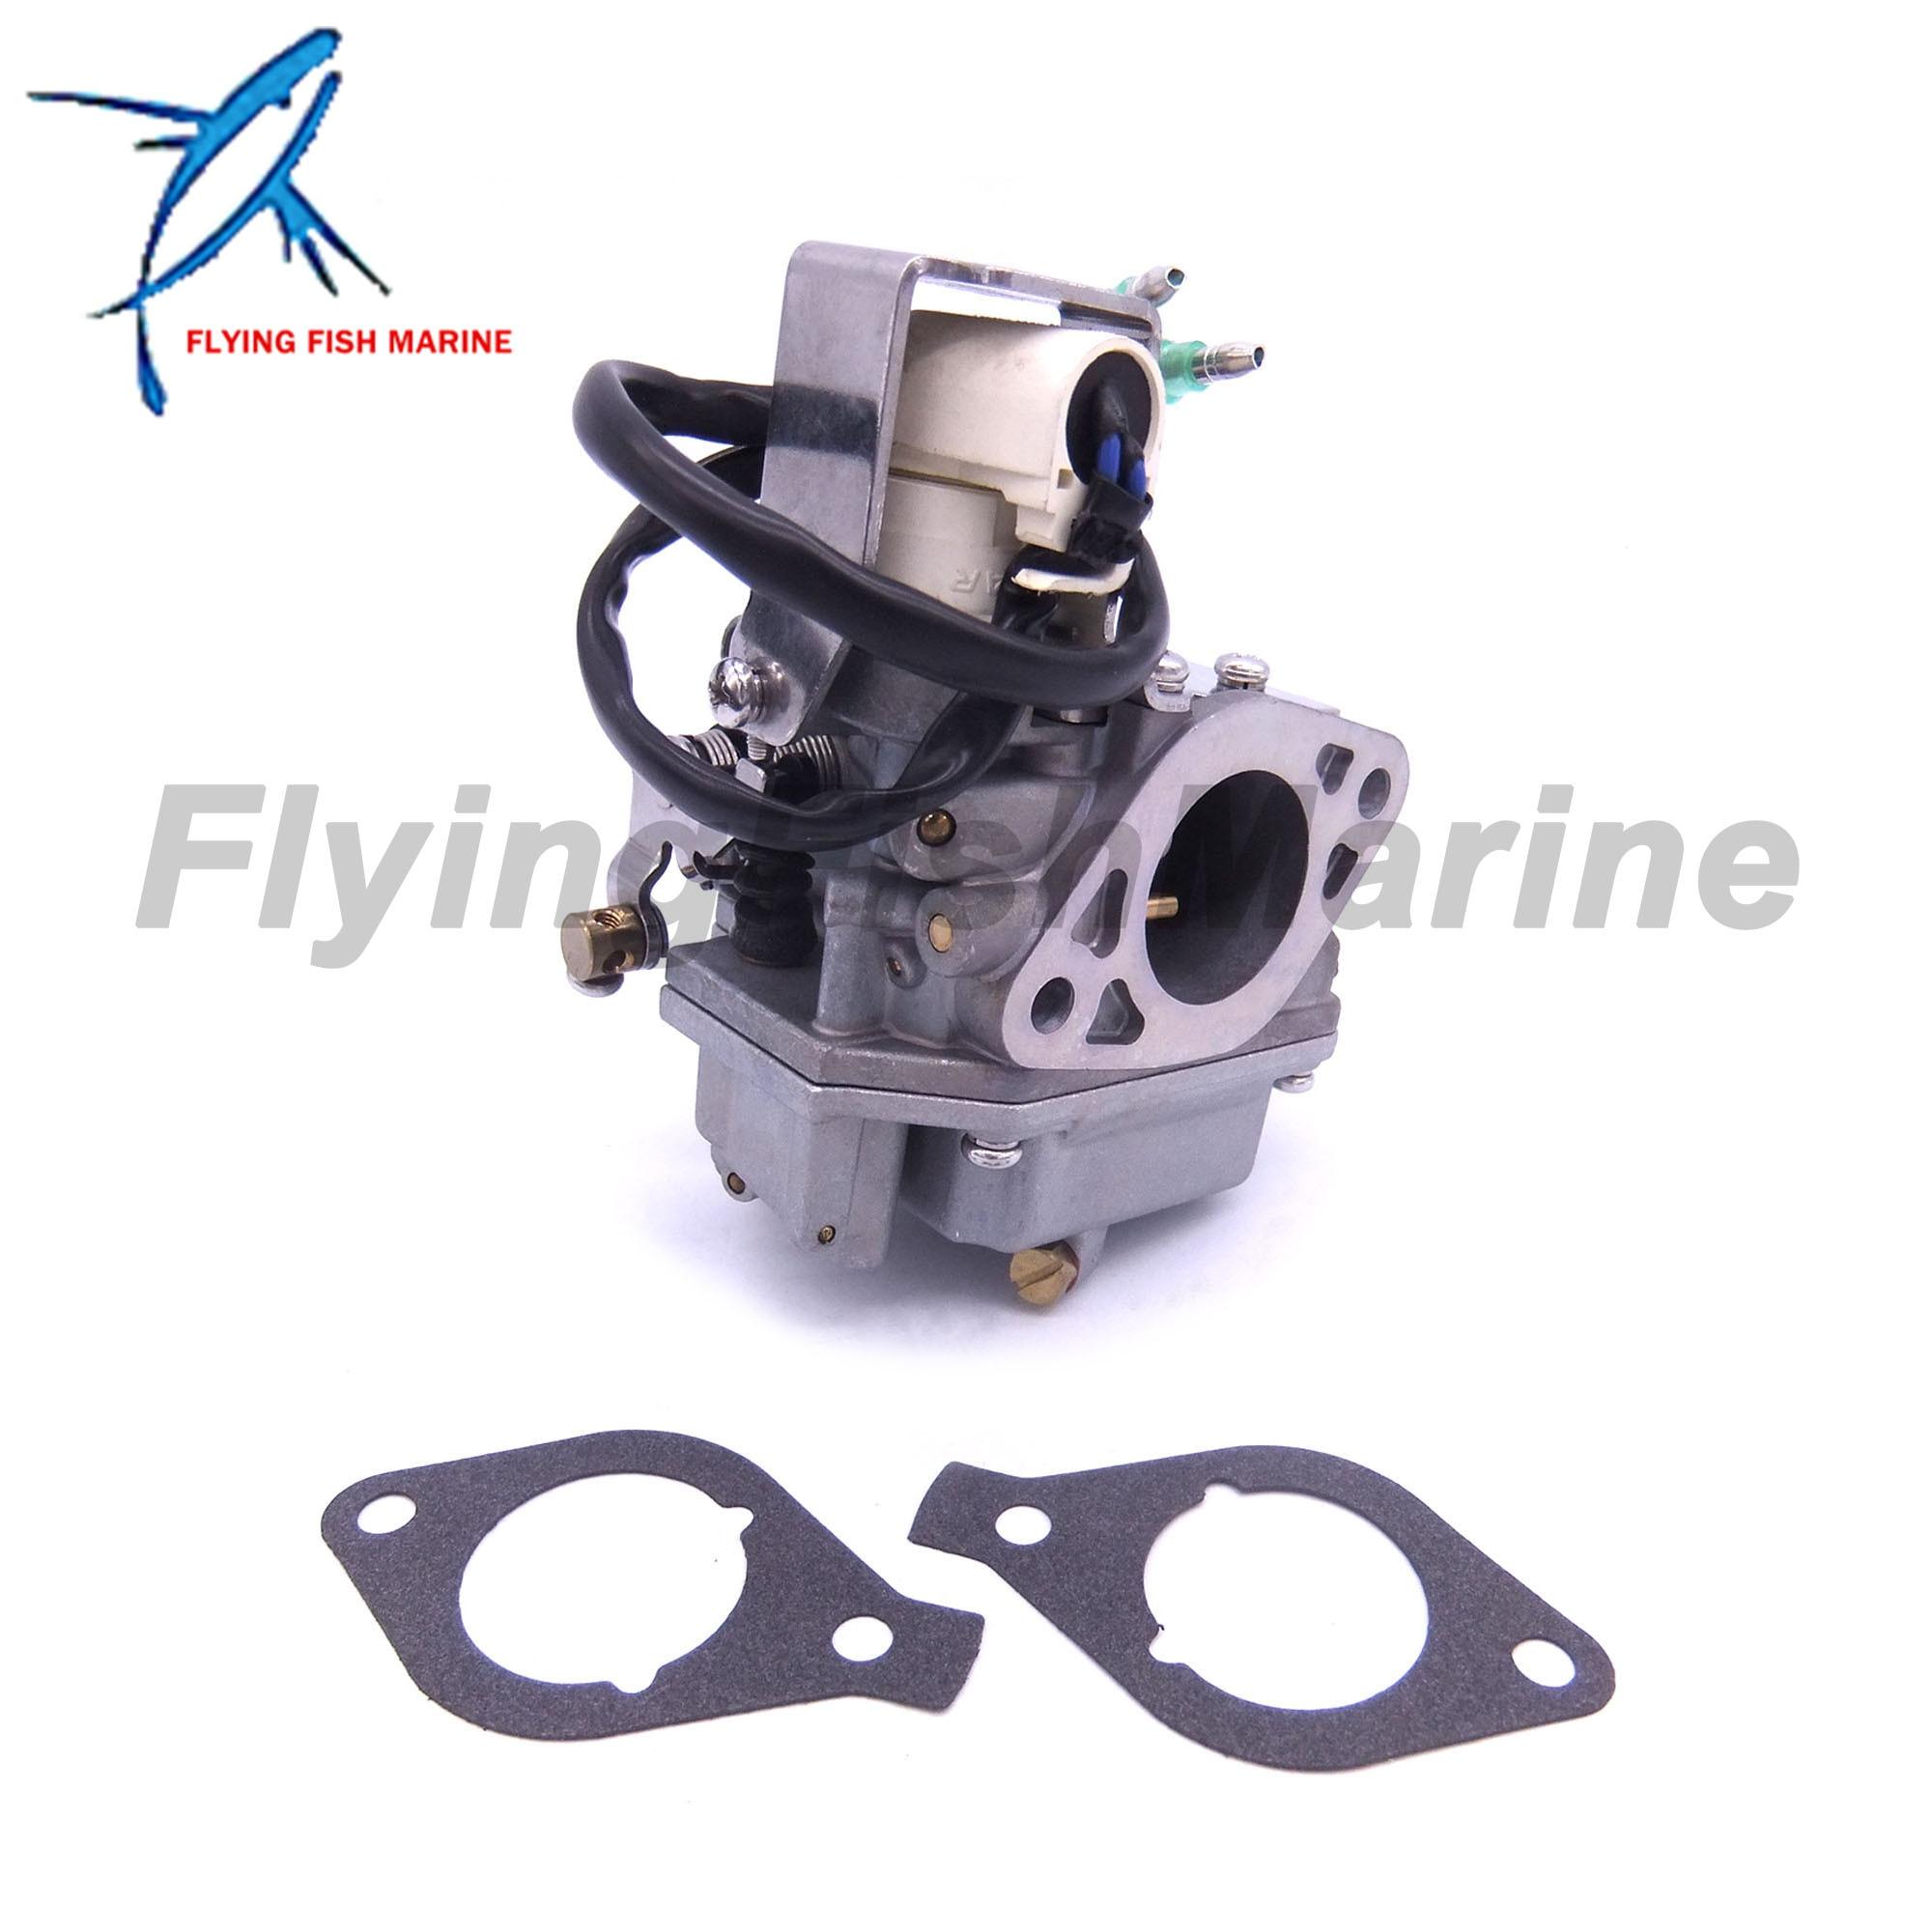 Outboard Motor 6AH-14301-00 6AH-14301-01 Carburetor Assy And 6AH-13646-00 Gaskets (2 Pcs) For Yamaha 4-stroke F20 Boat Engine